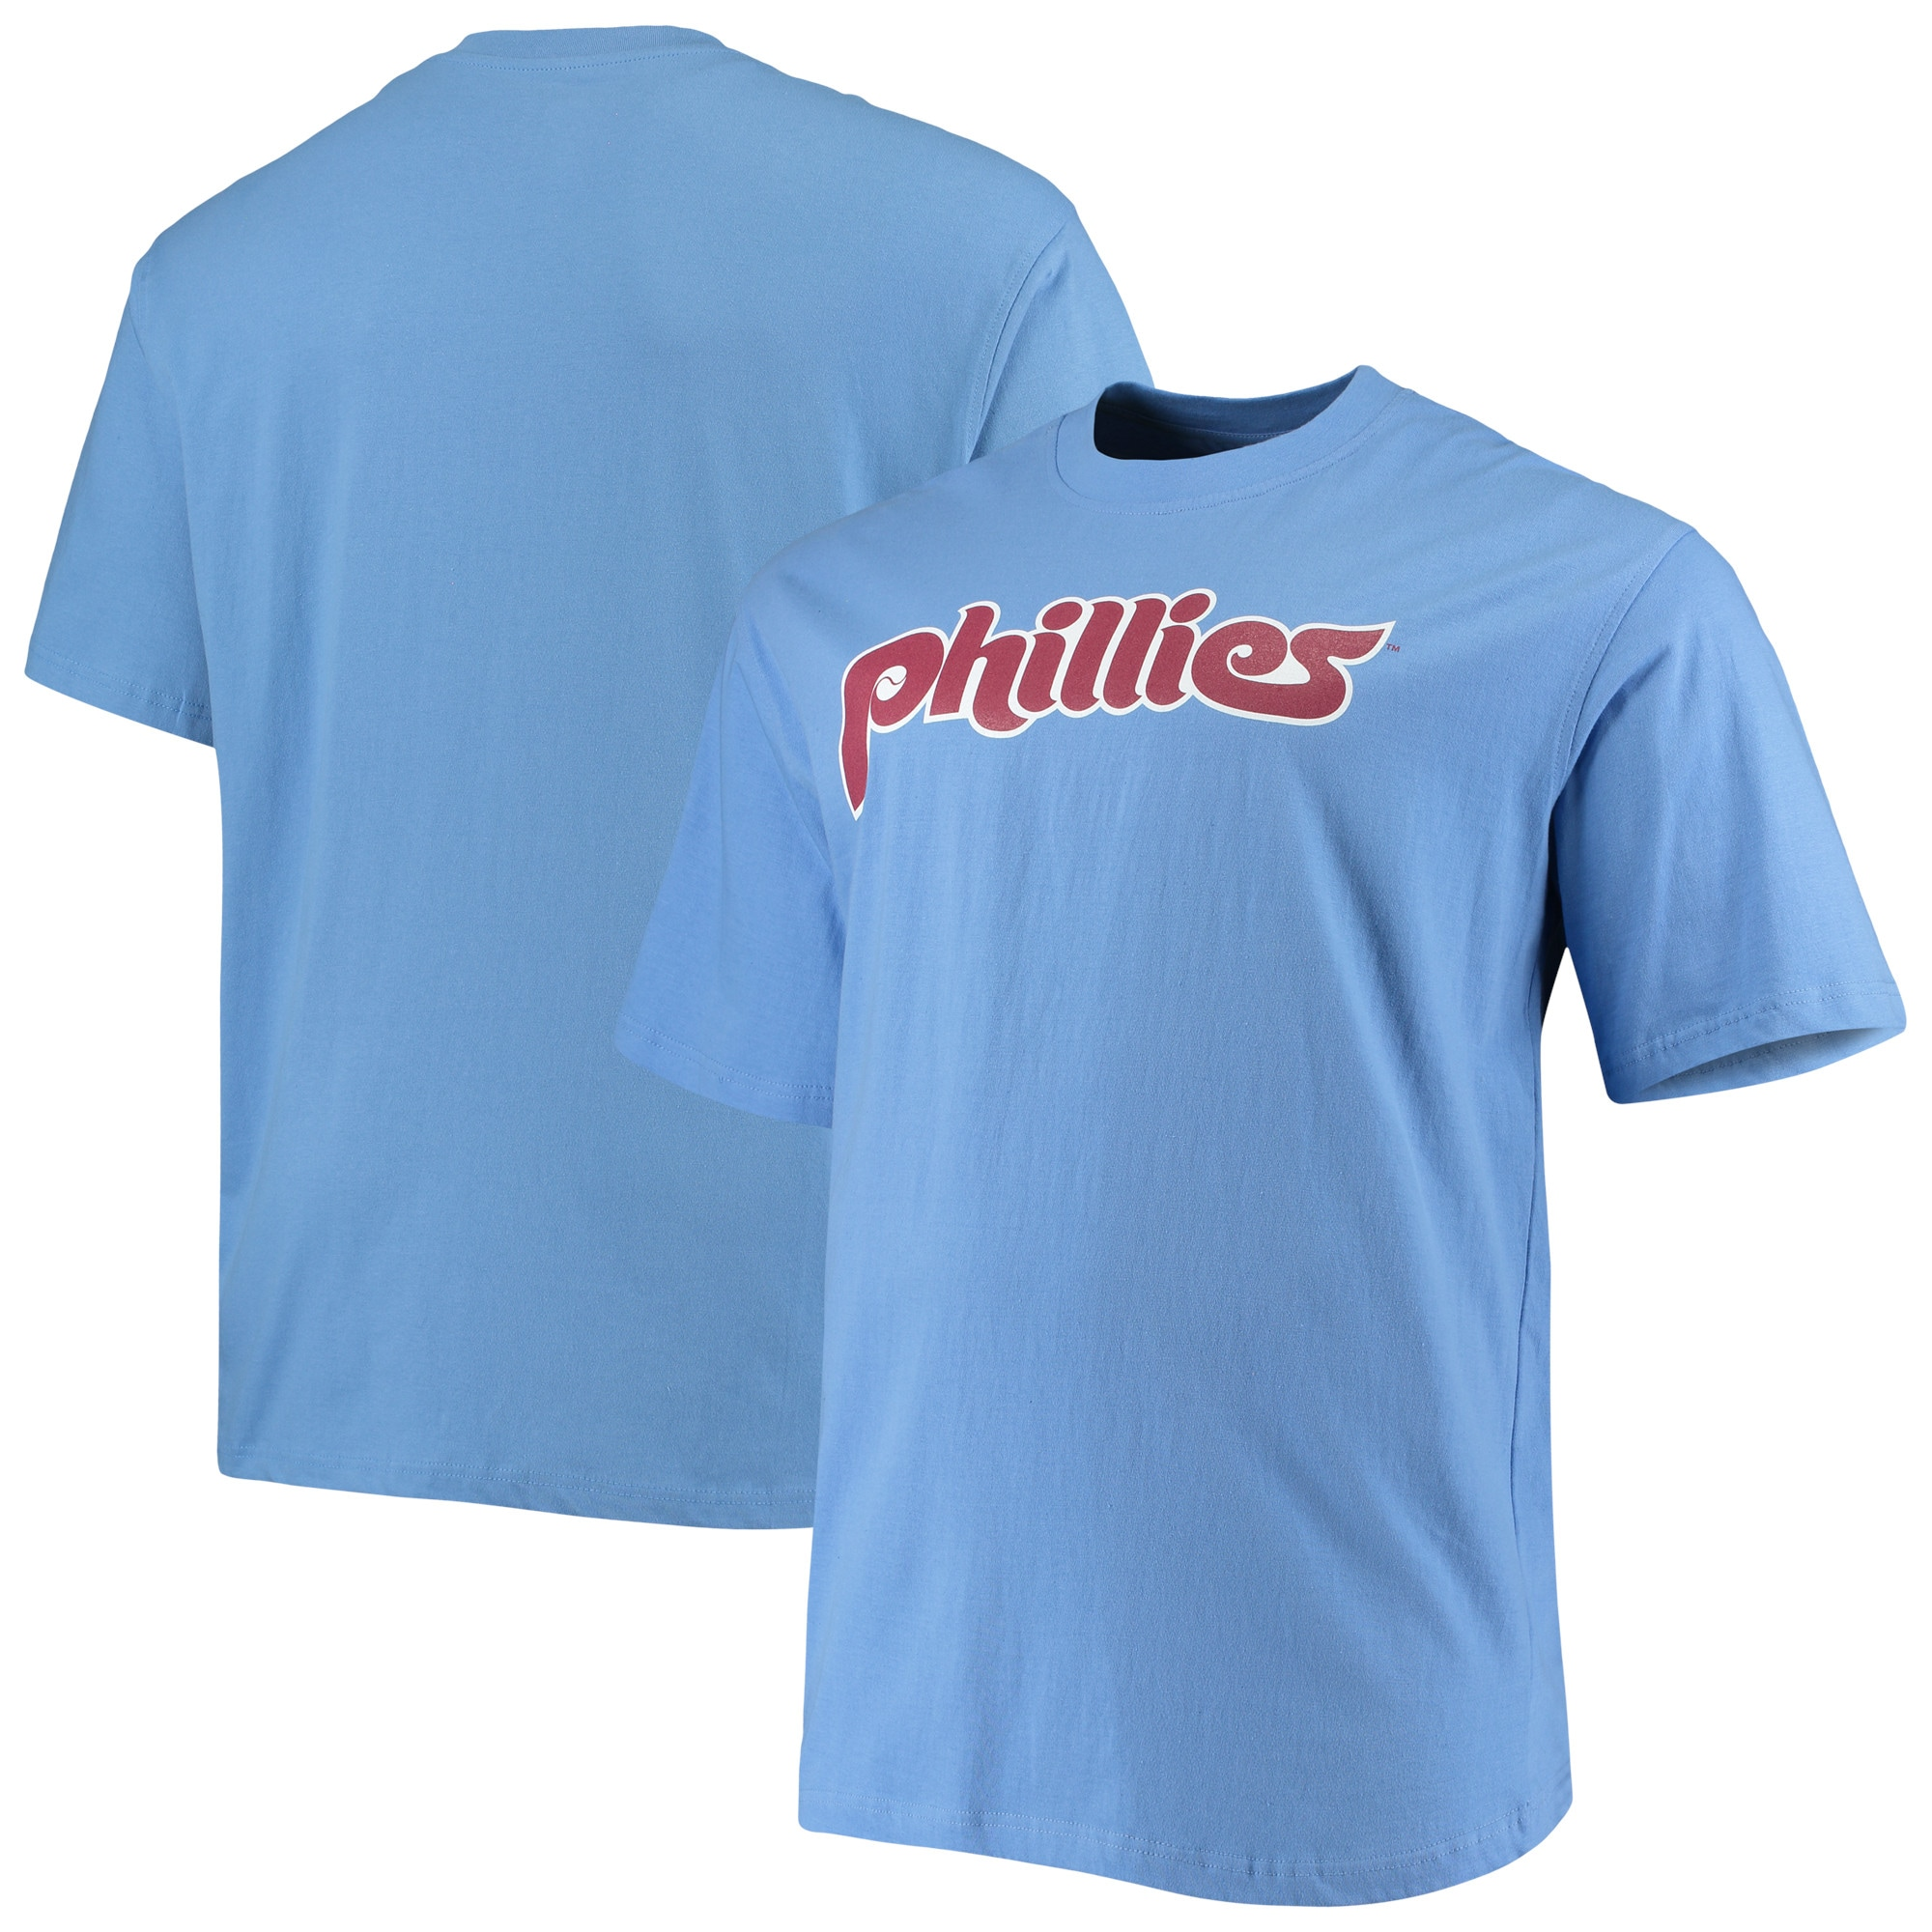 Philadelphia Phillies Big & Tall Cooperstown Collection Wordmark T-Shirt - Light Blue